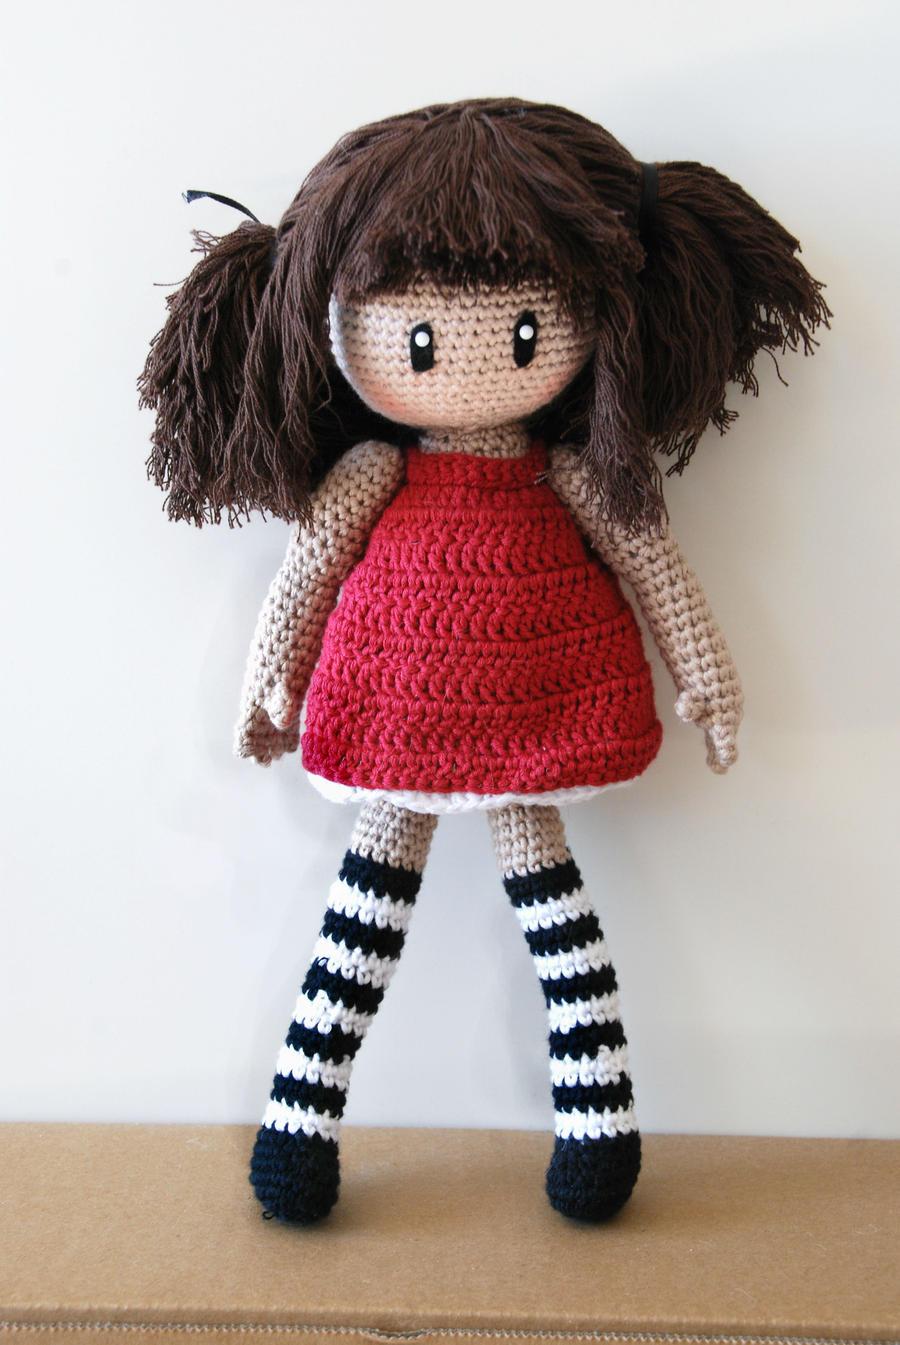 Crochet : Gorjuss amigurumi by Ahookamigurumi